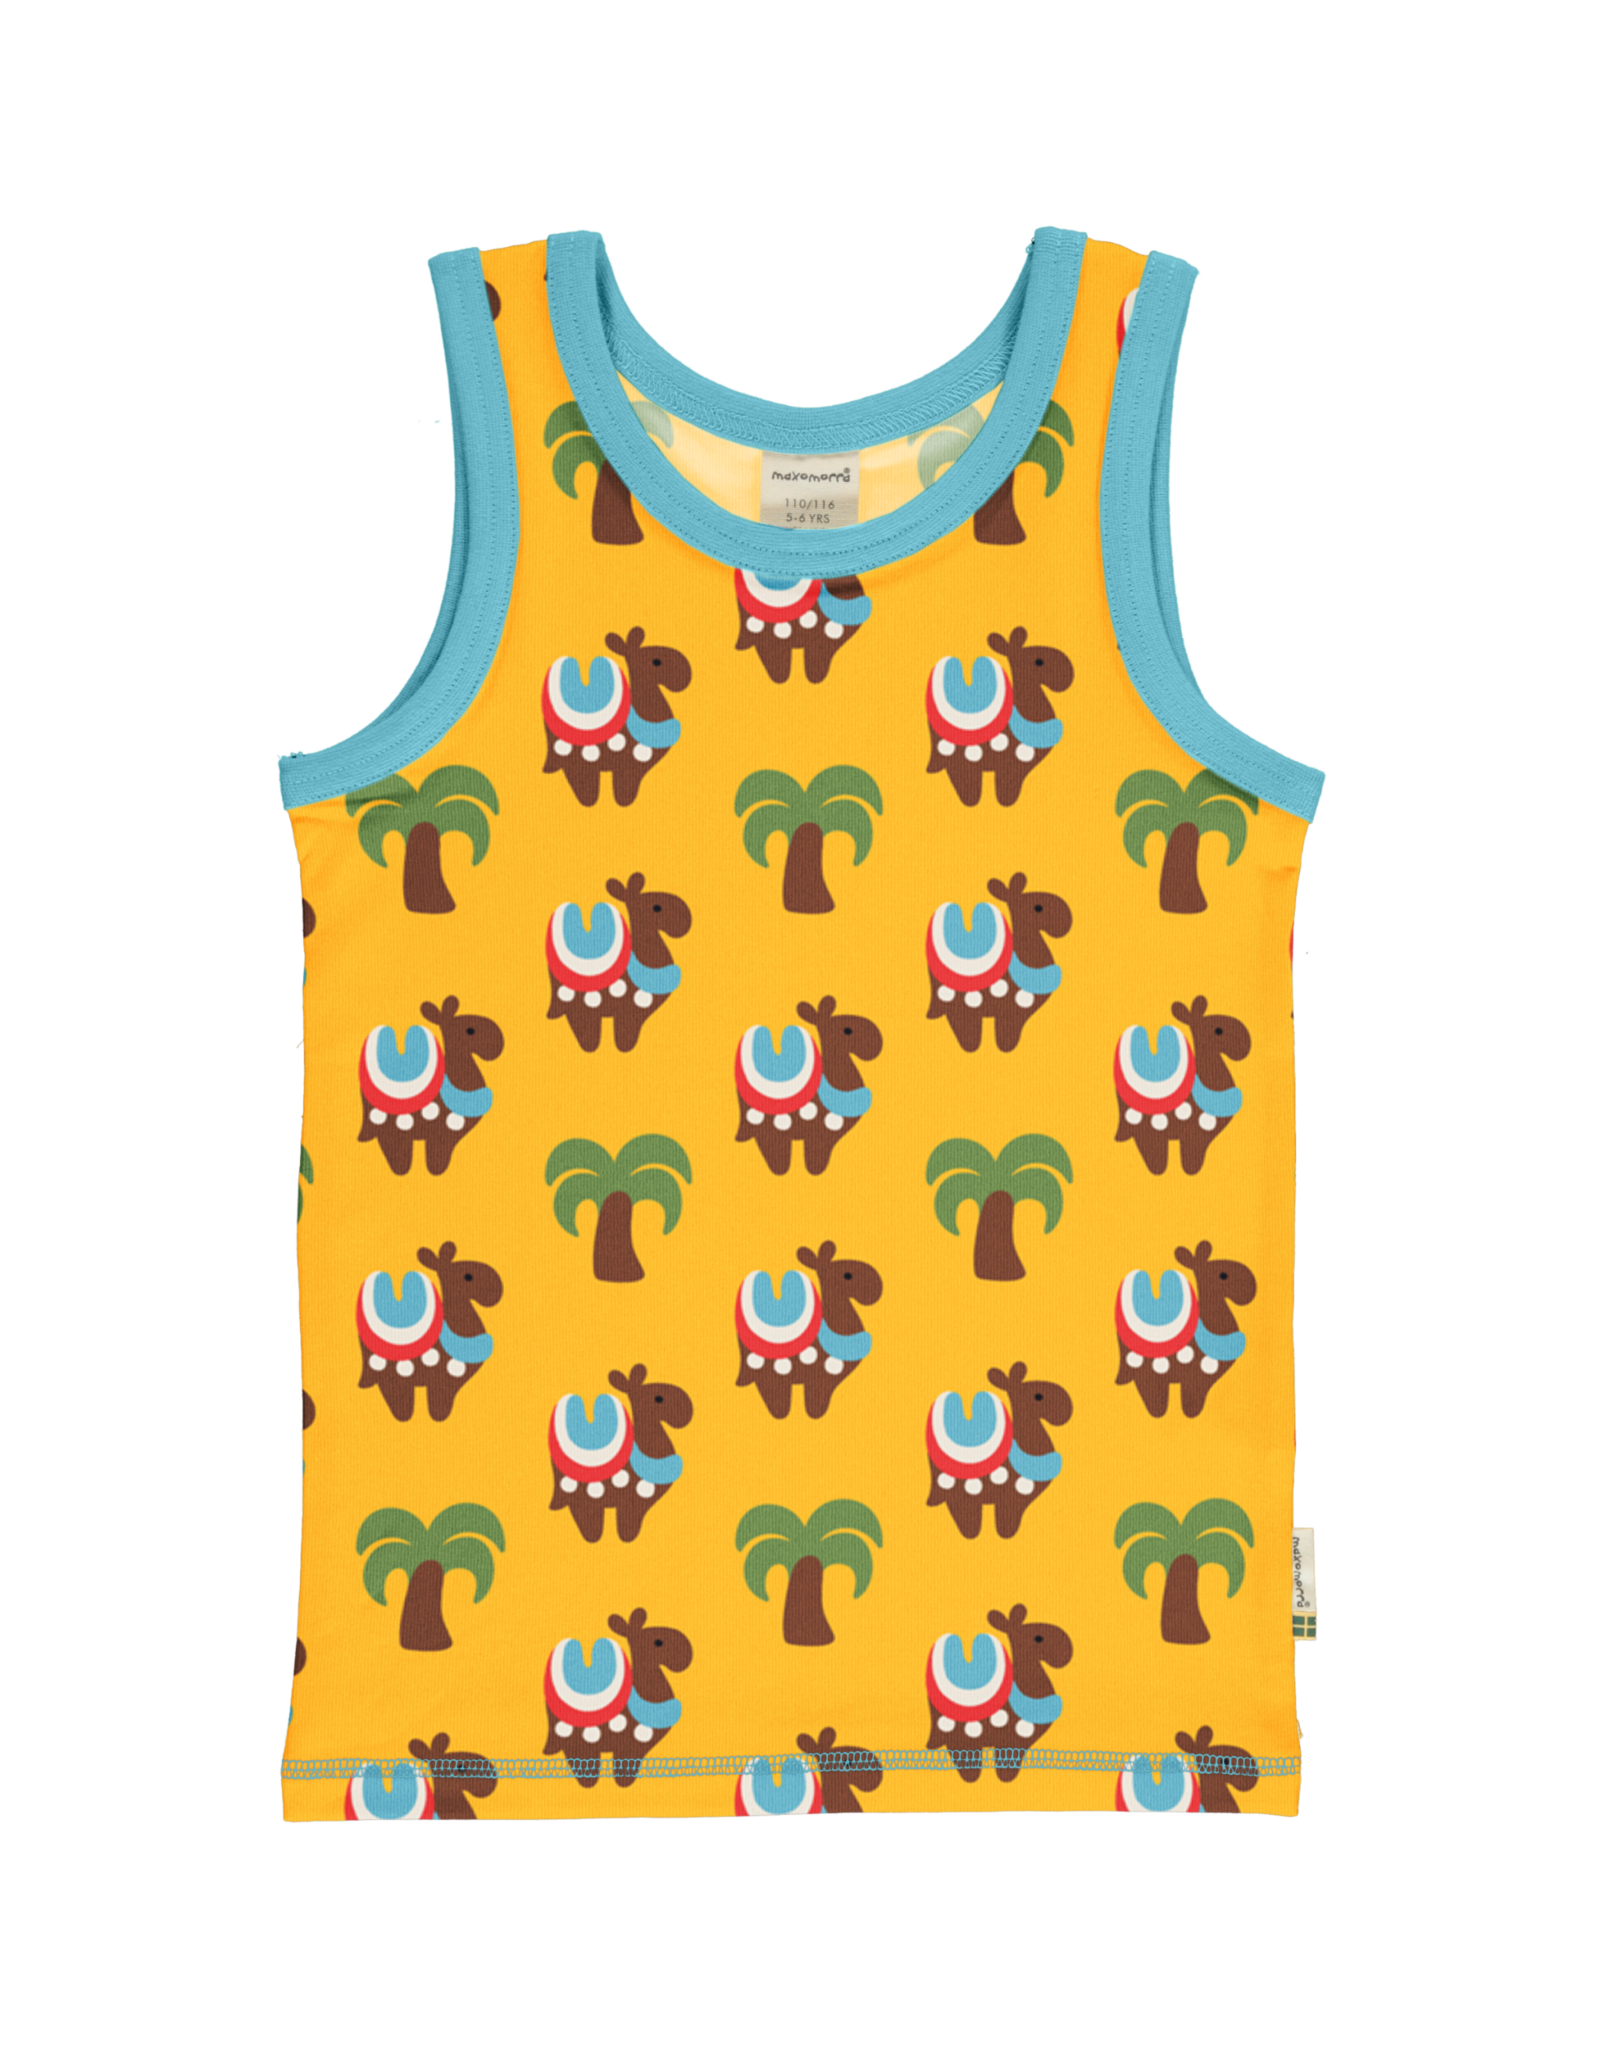 Maxomorra Mouwloze gele t-shirt van Maxomorra met kamelen print